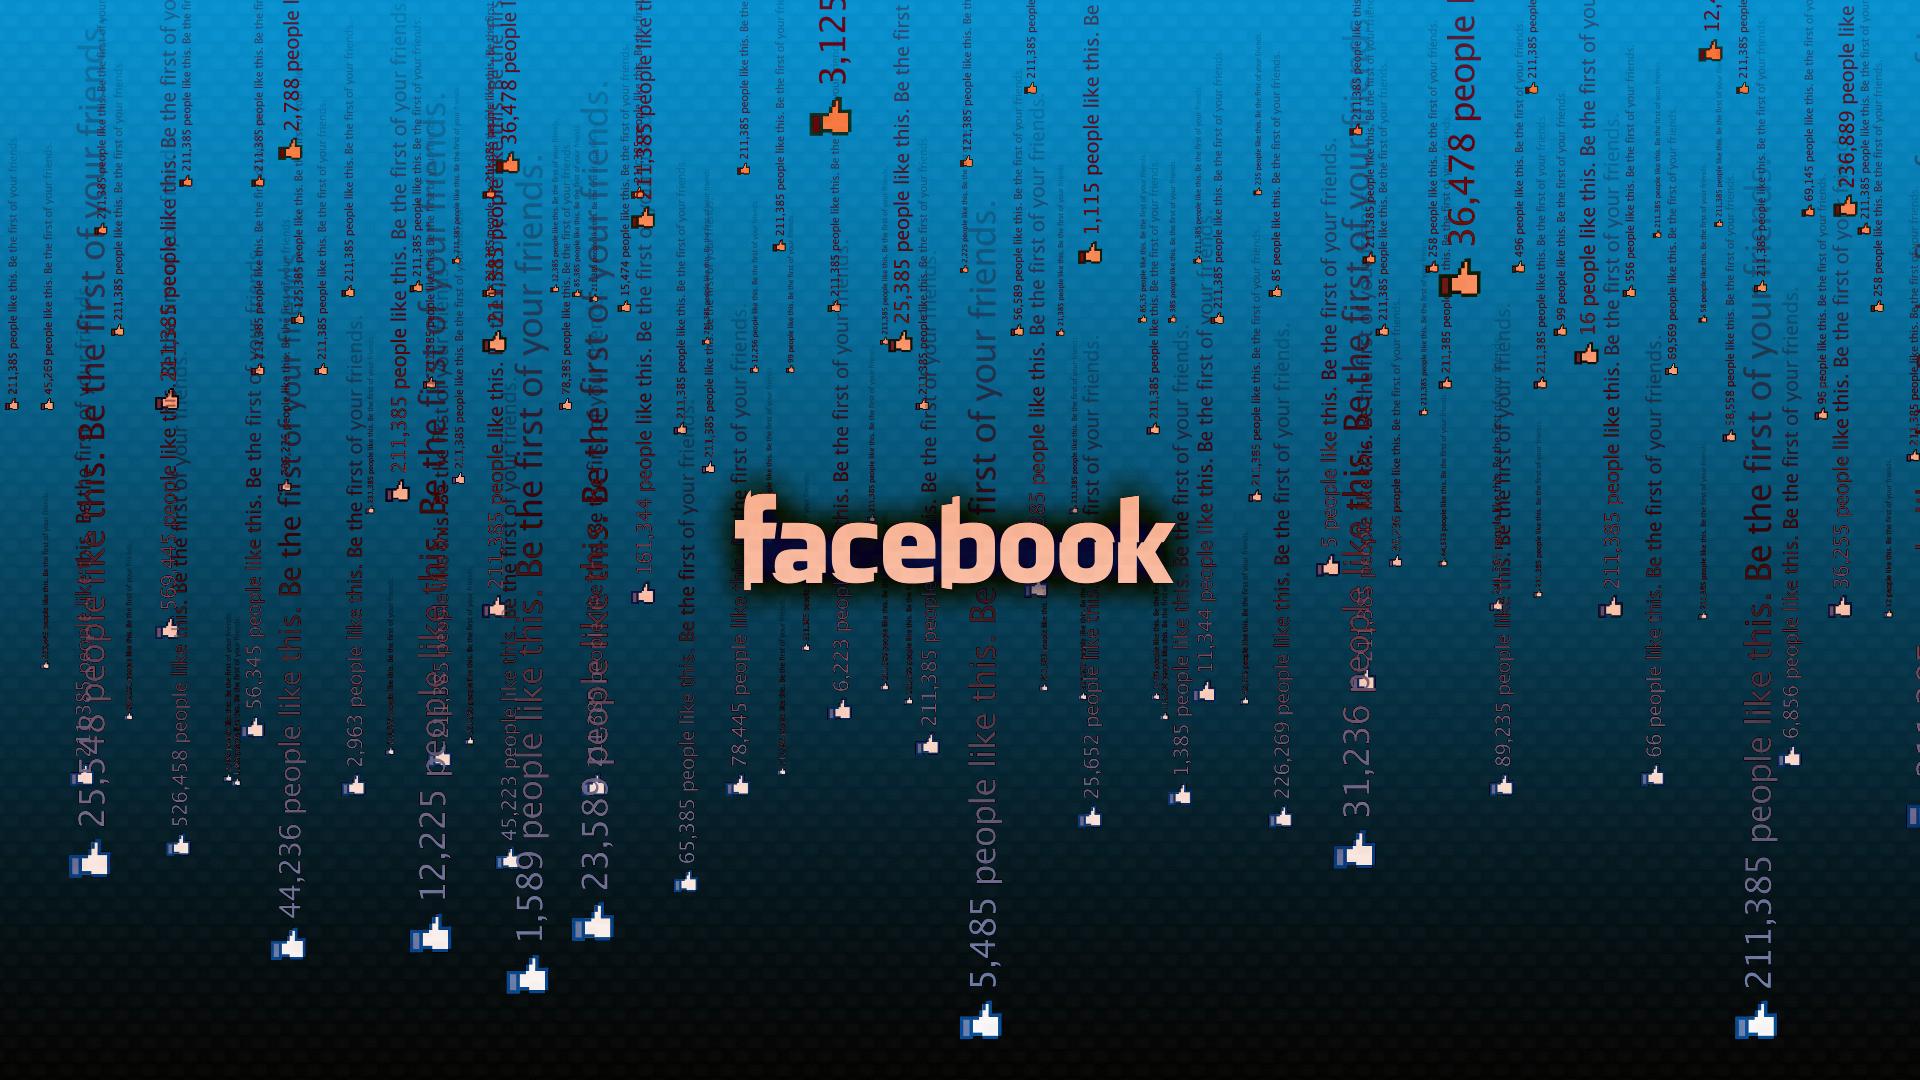 description facebook wallpaper is - photo #31